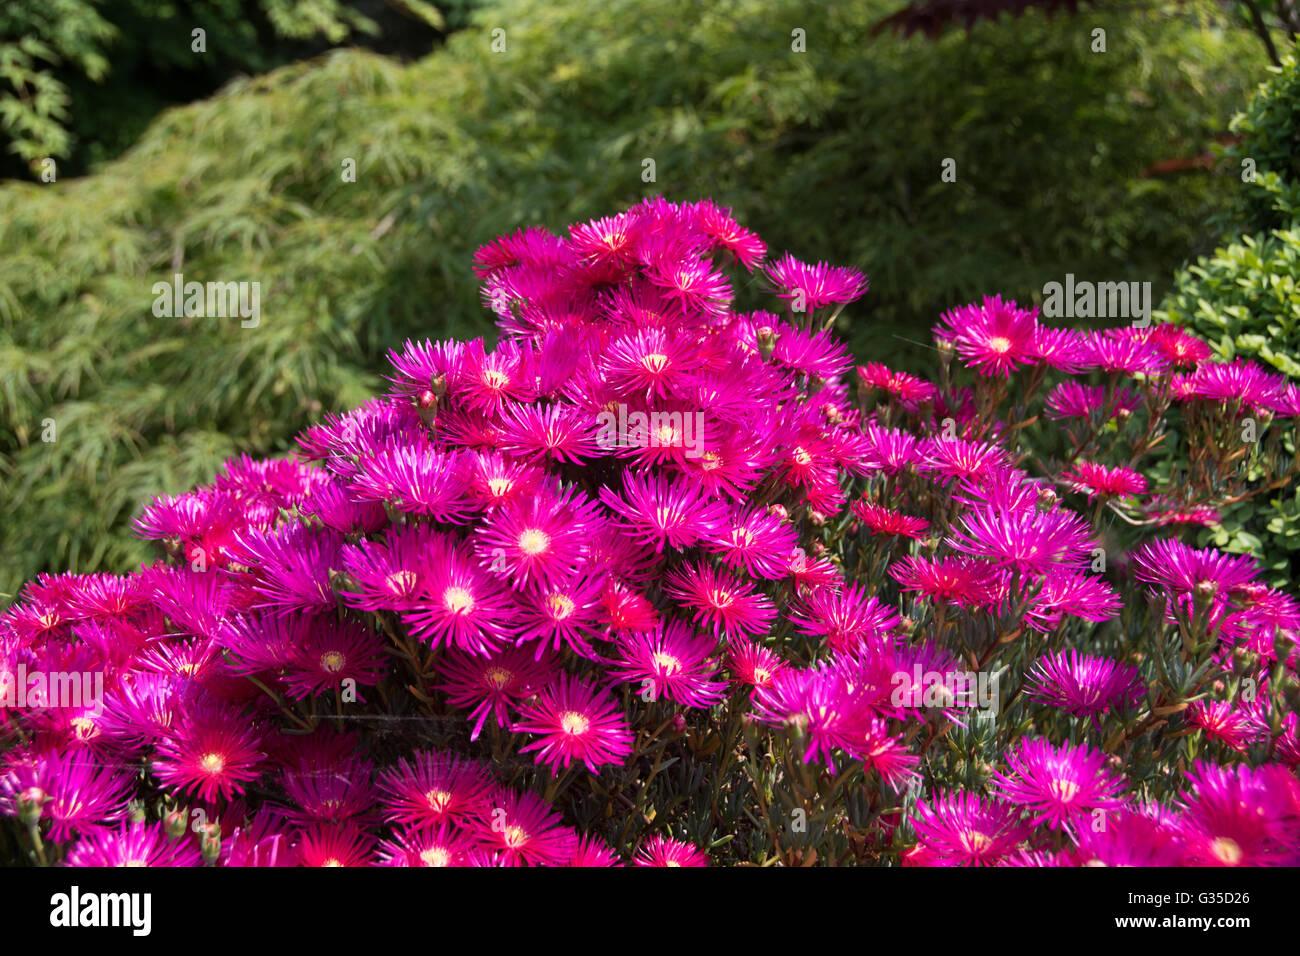 The stunning magenta flowers of sun-loving Lampranthus spectabilis - Stock Image